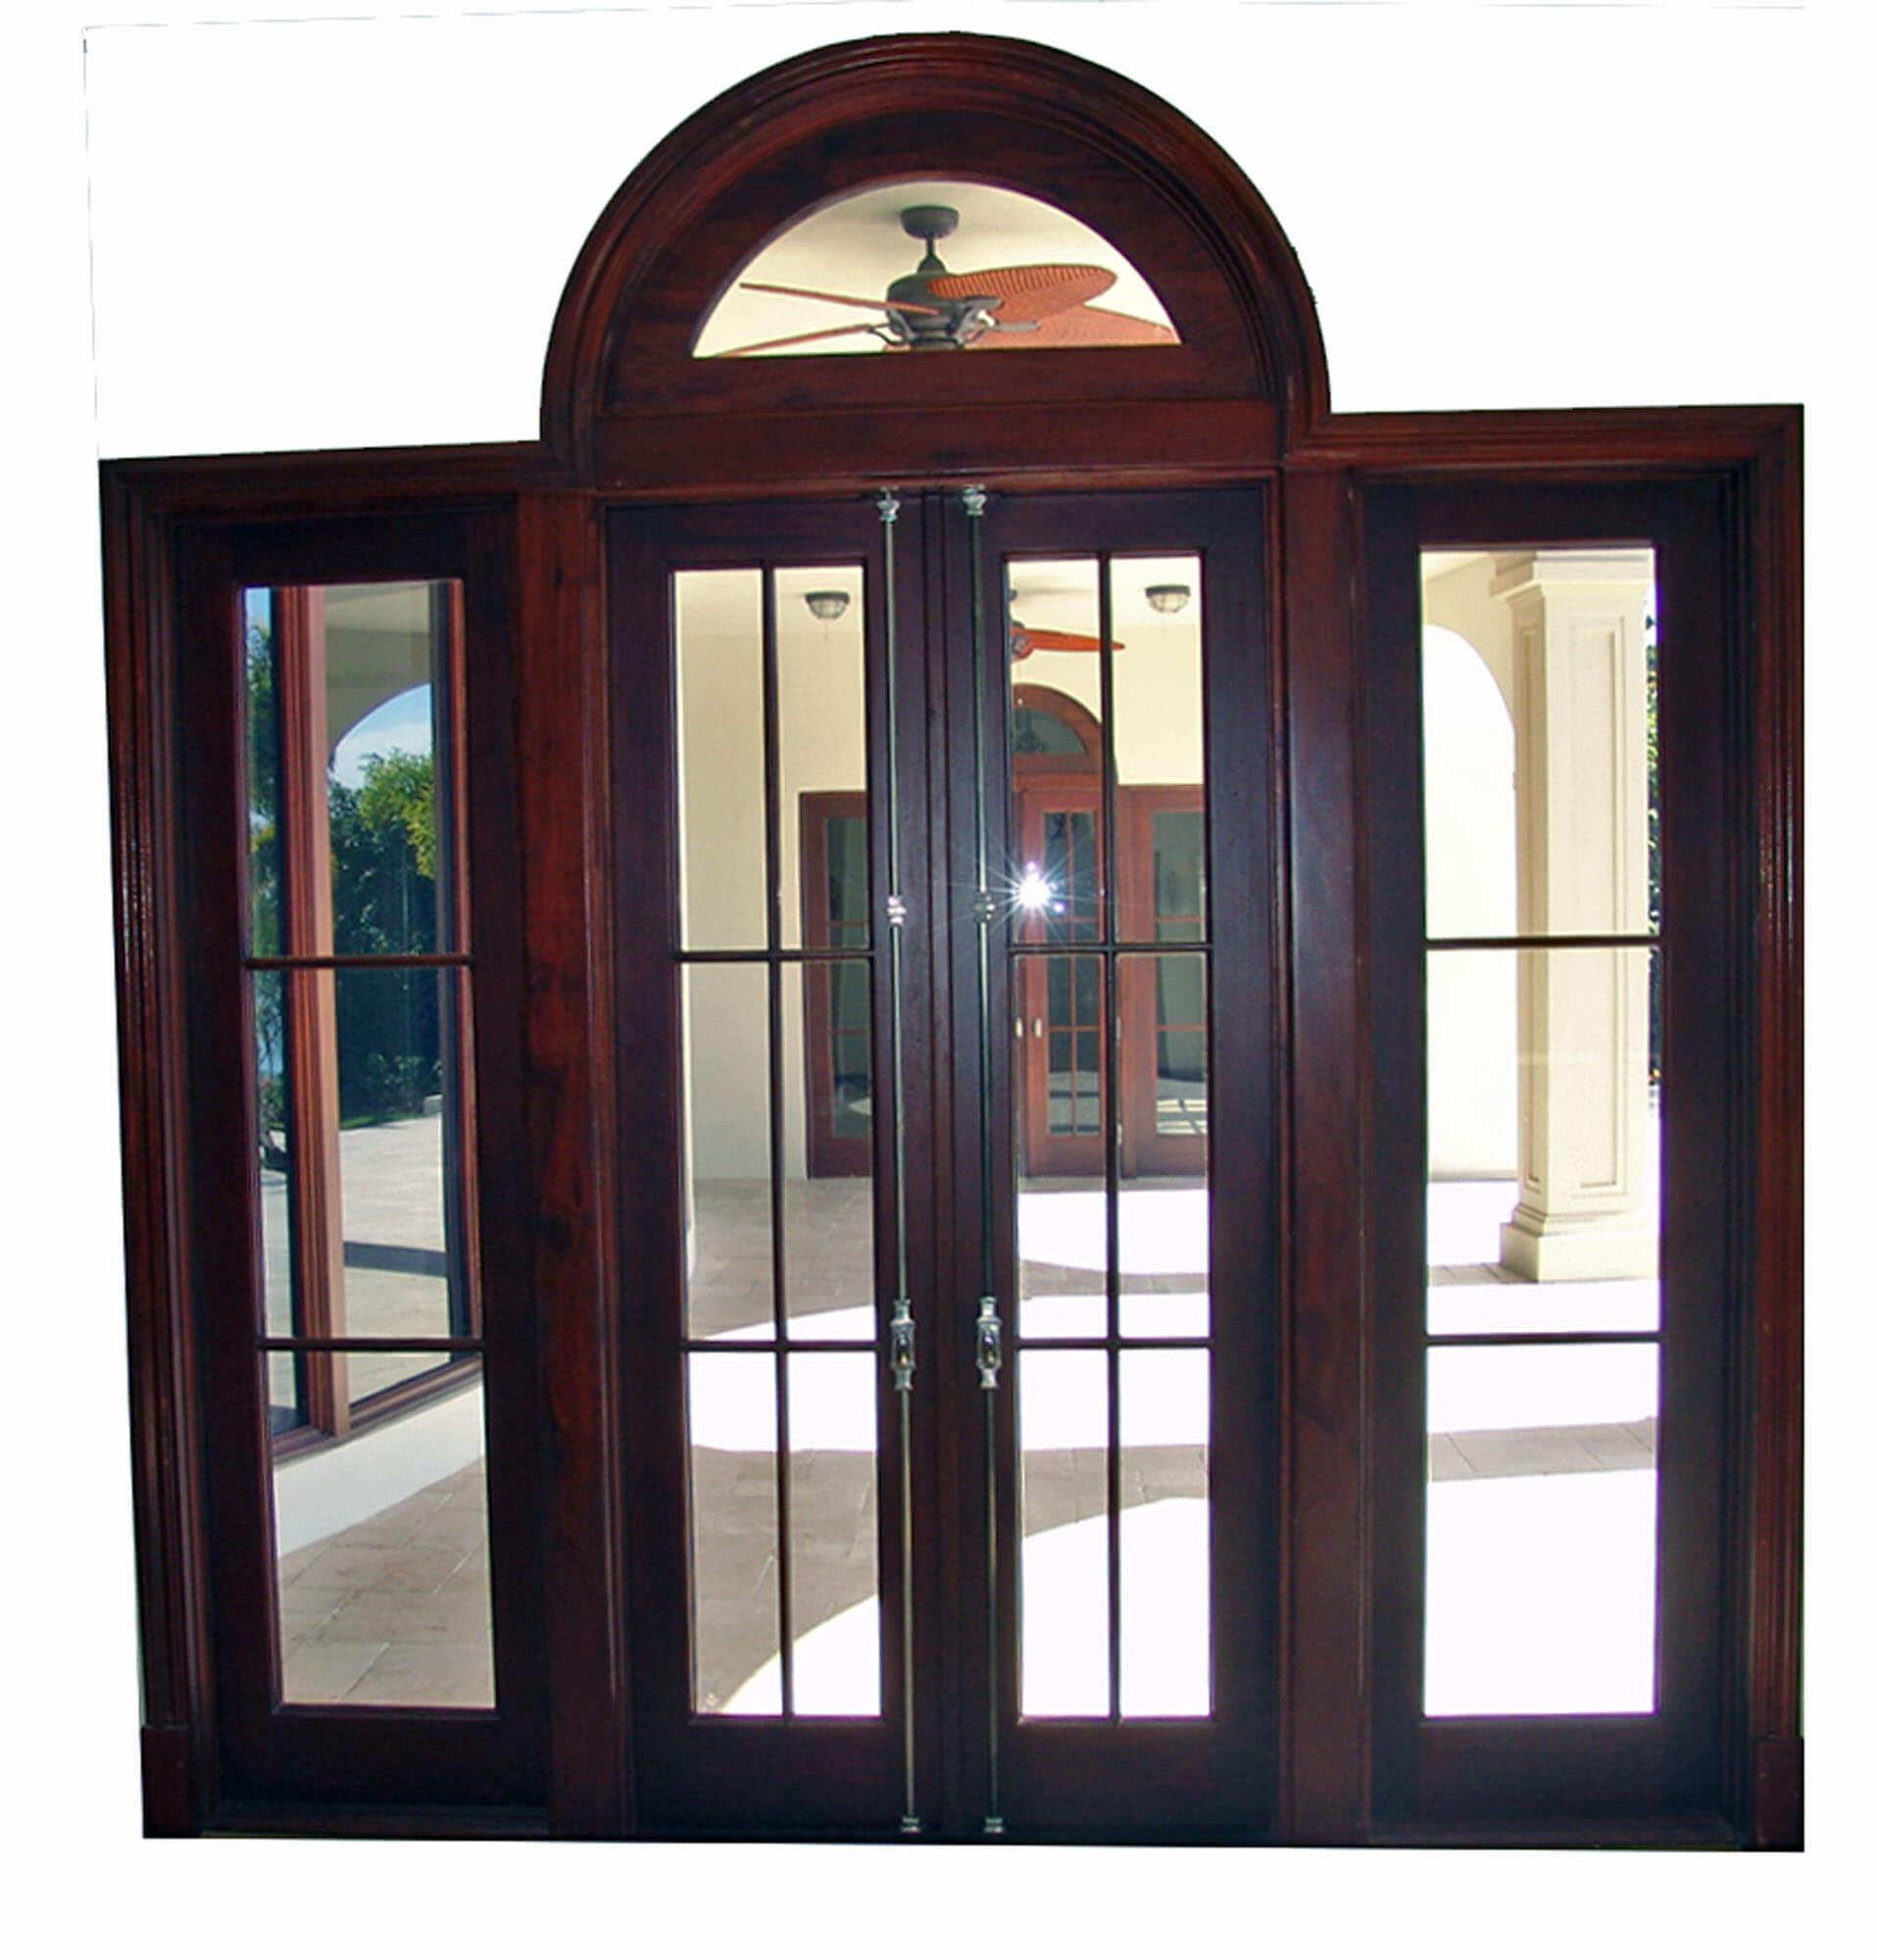 BAL HARBOUR MAHOGANY DOORS INTERIOR VIEW.